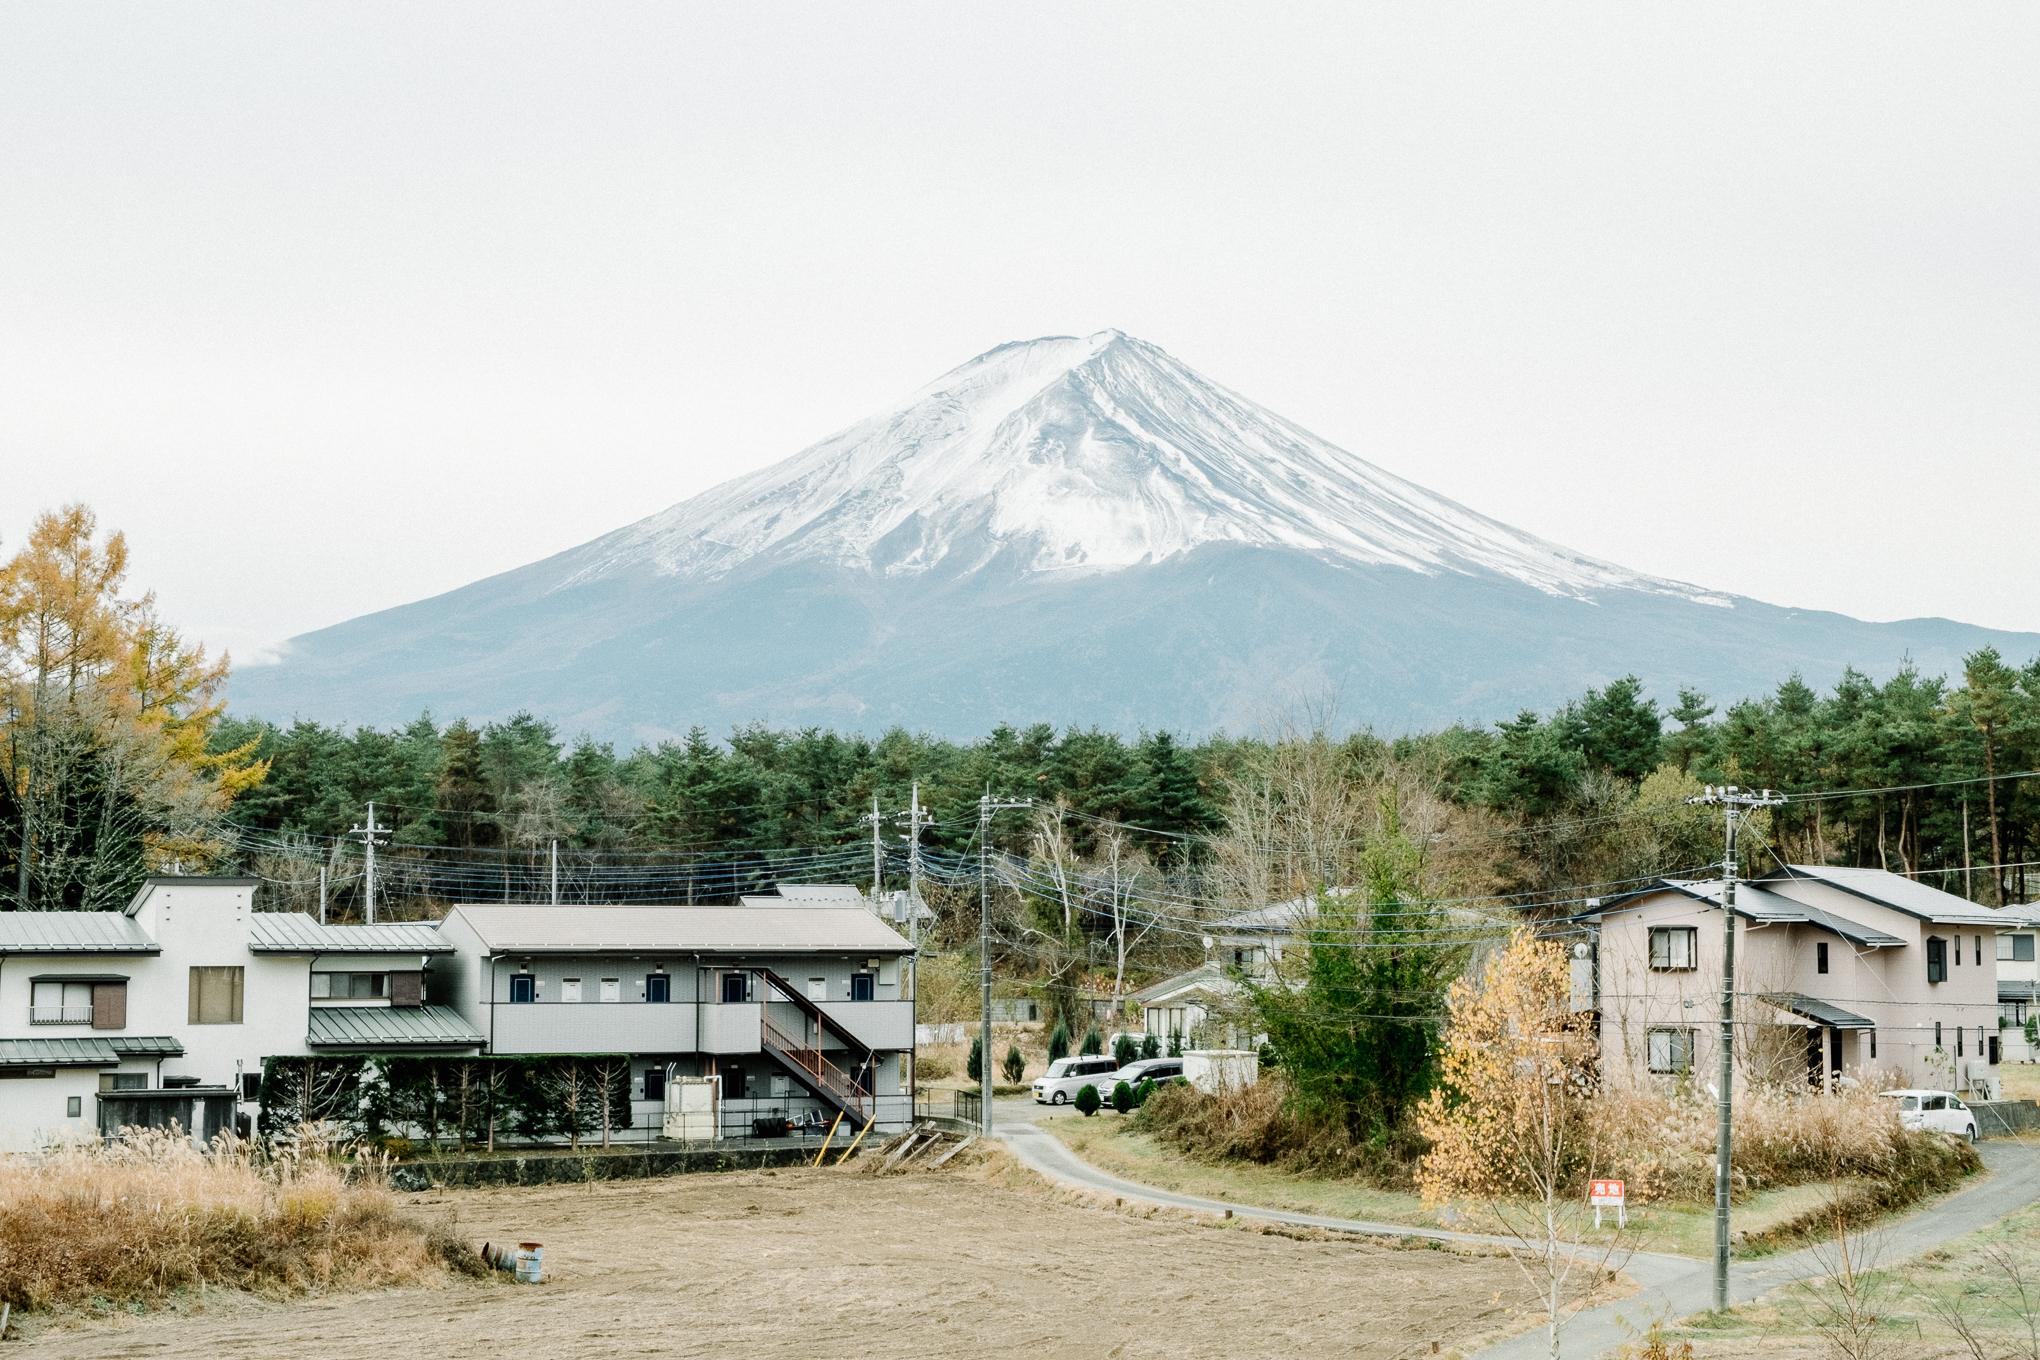 Charmaine Wu Photography Travel Photography Kawaguchiko Mt Fuji Japan Singapore